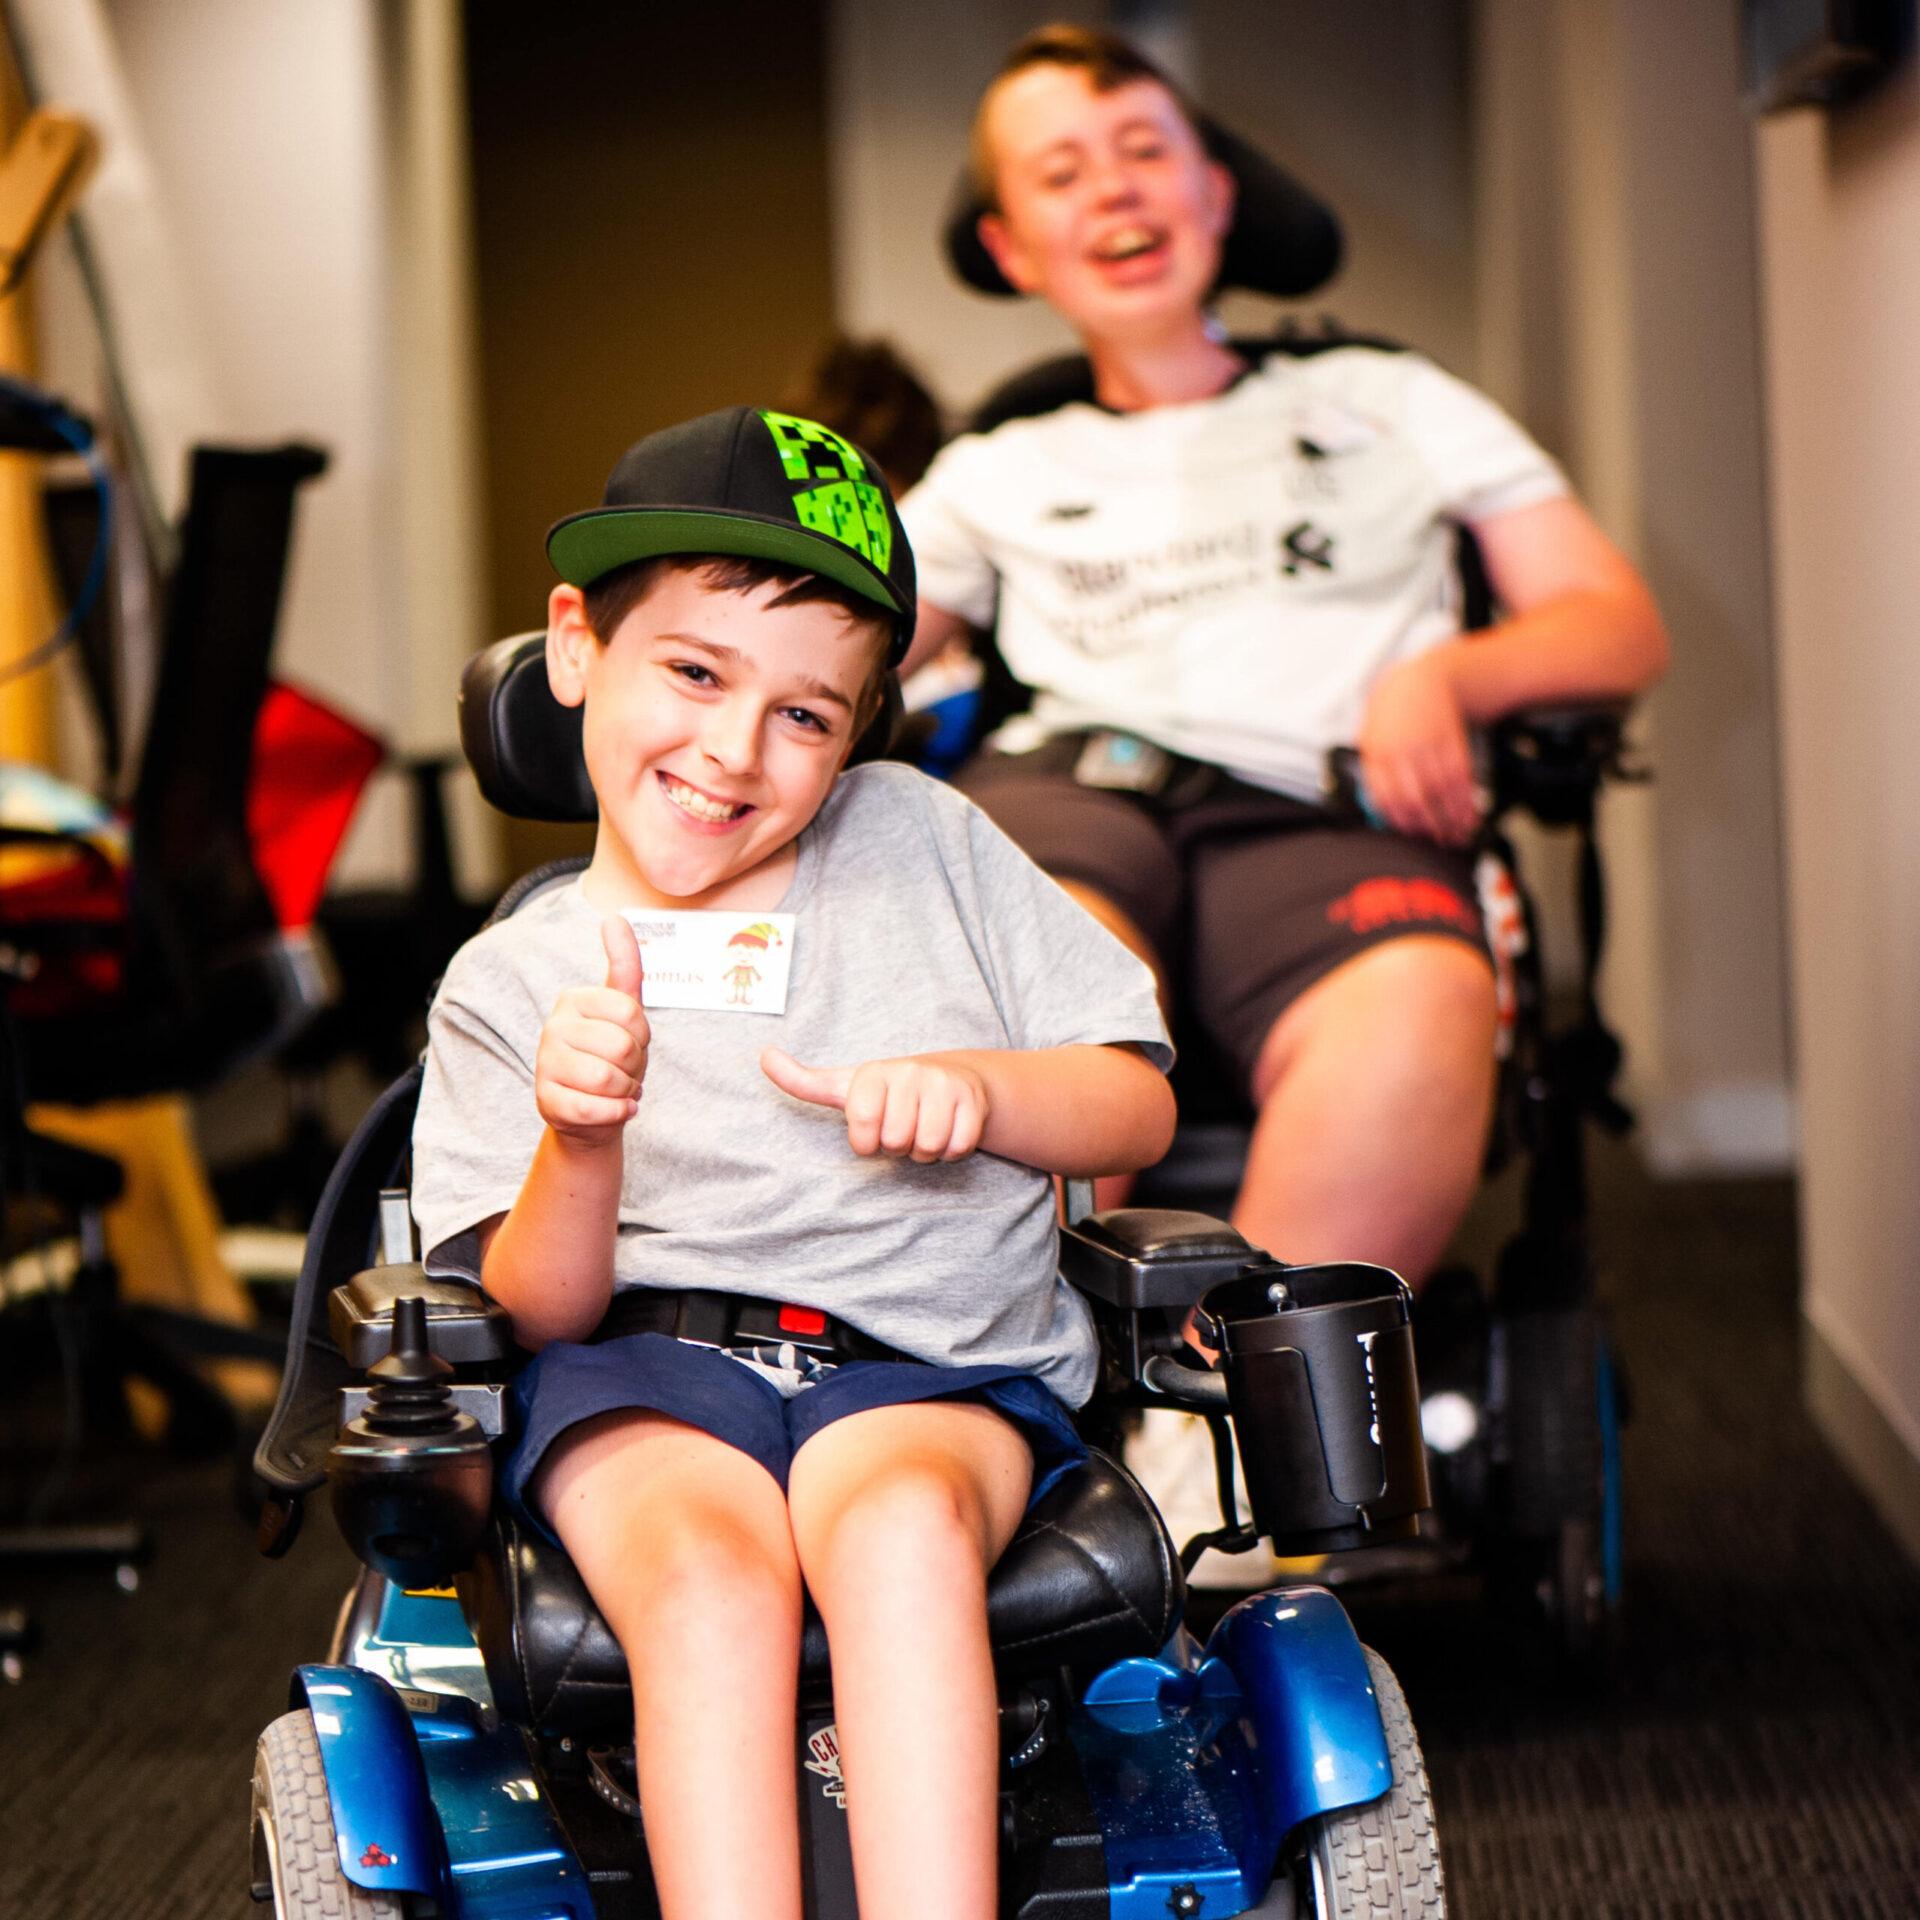 shows two boys having fun in their power wheelchairs